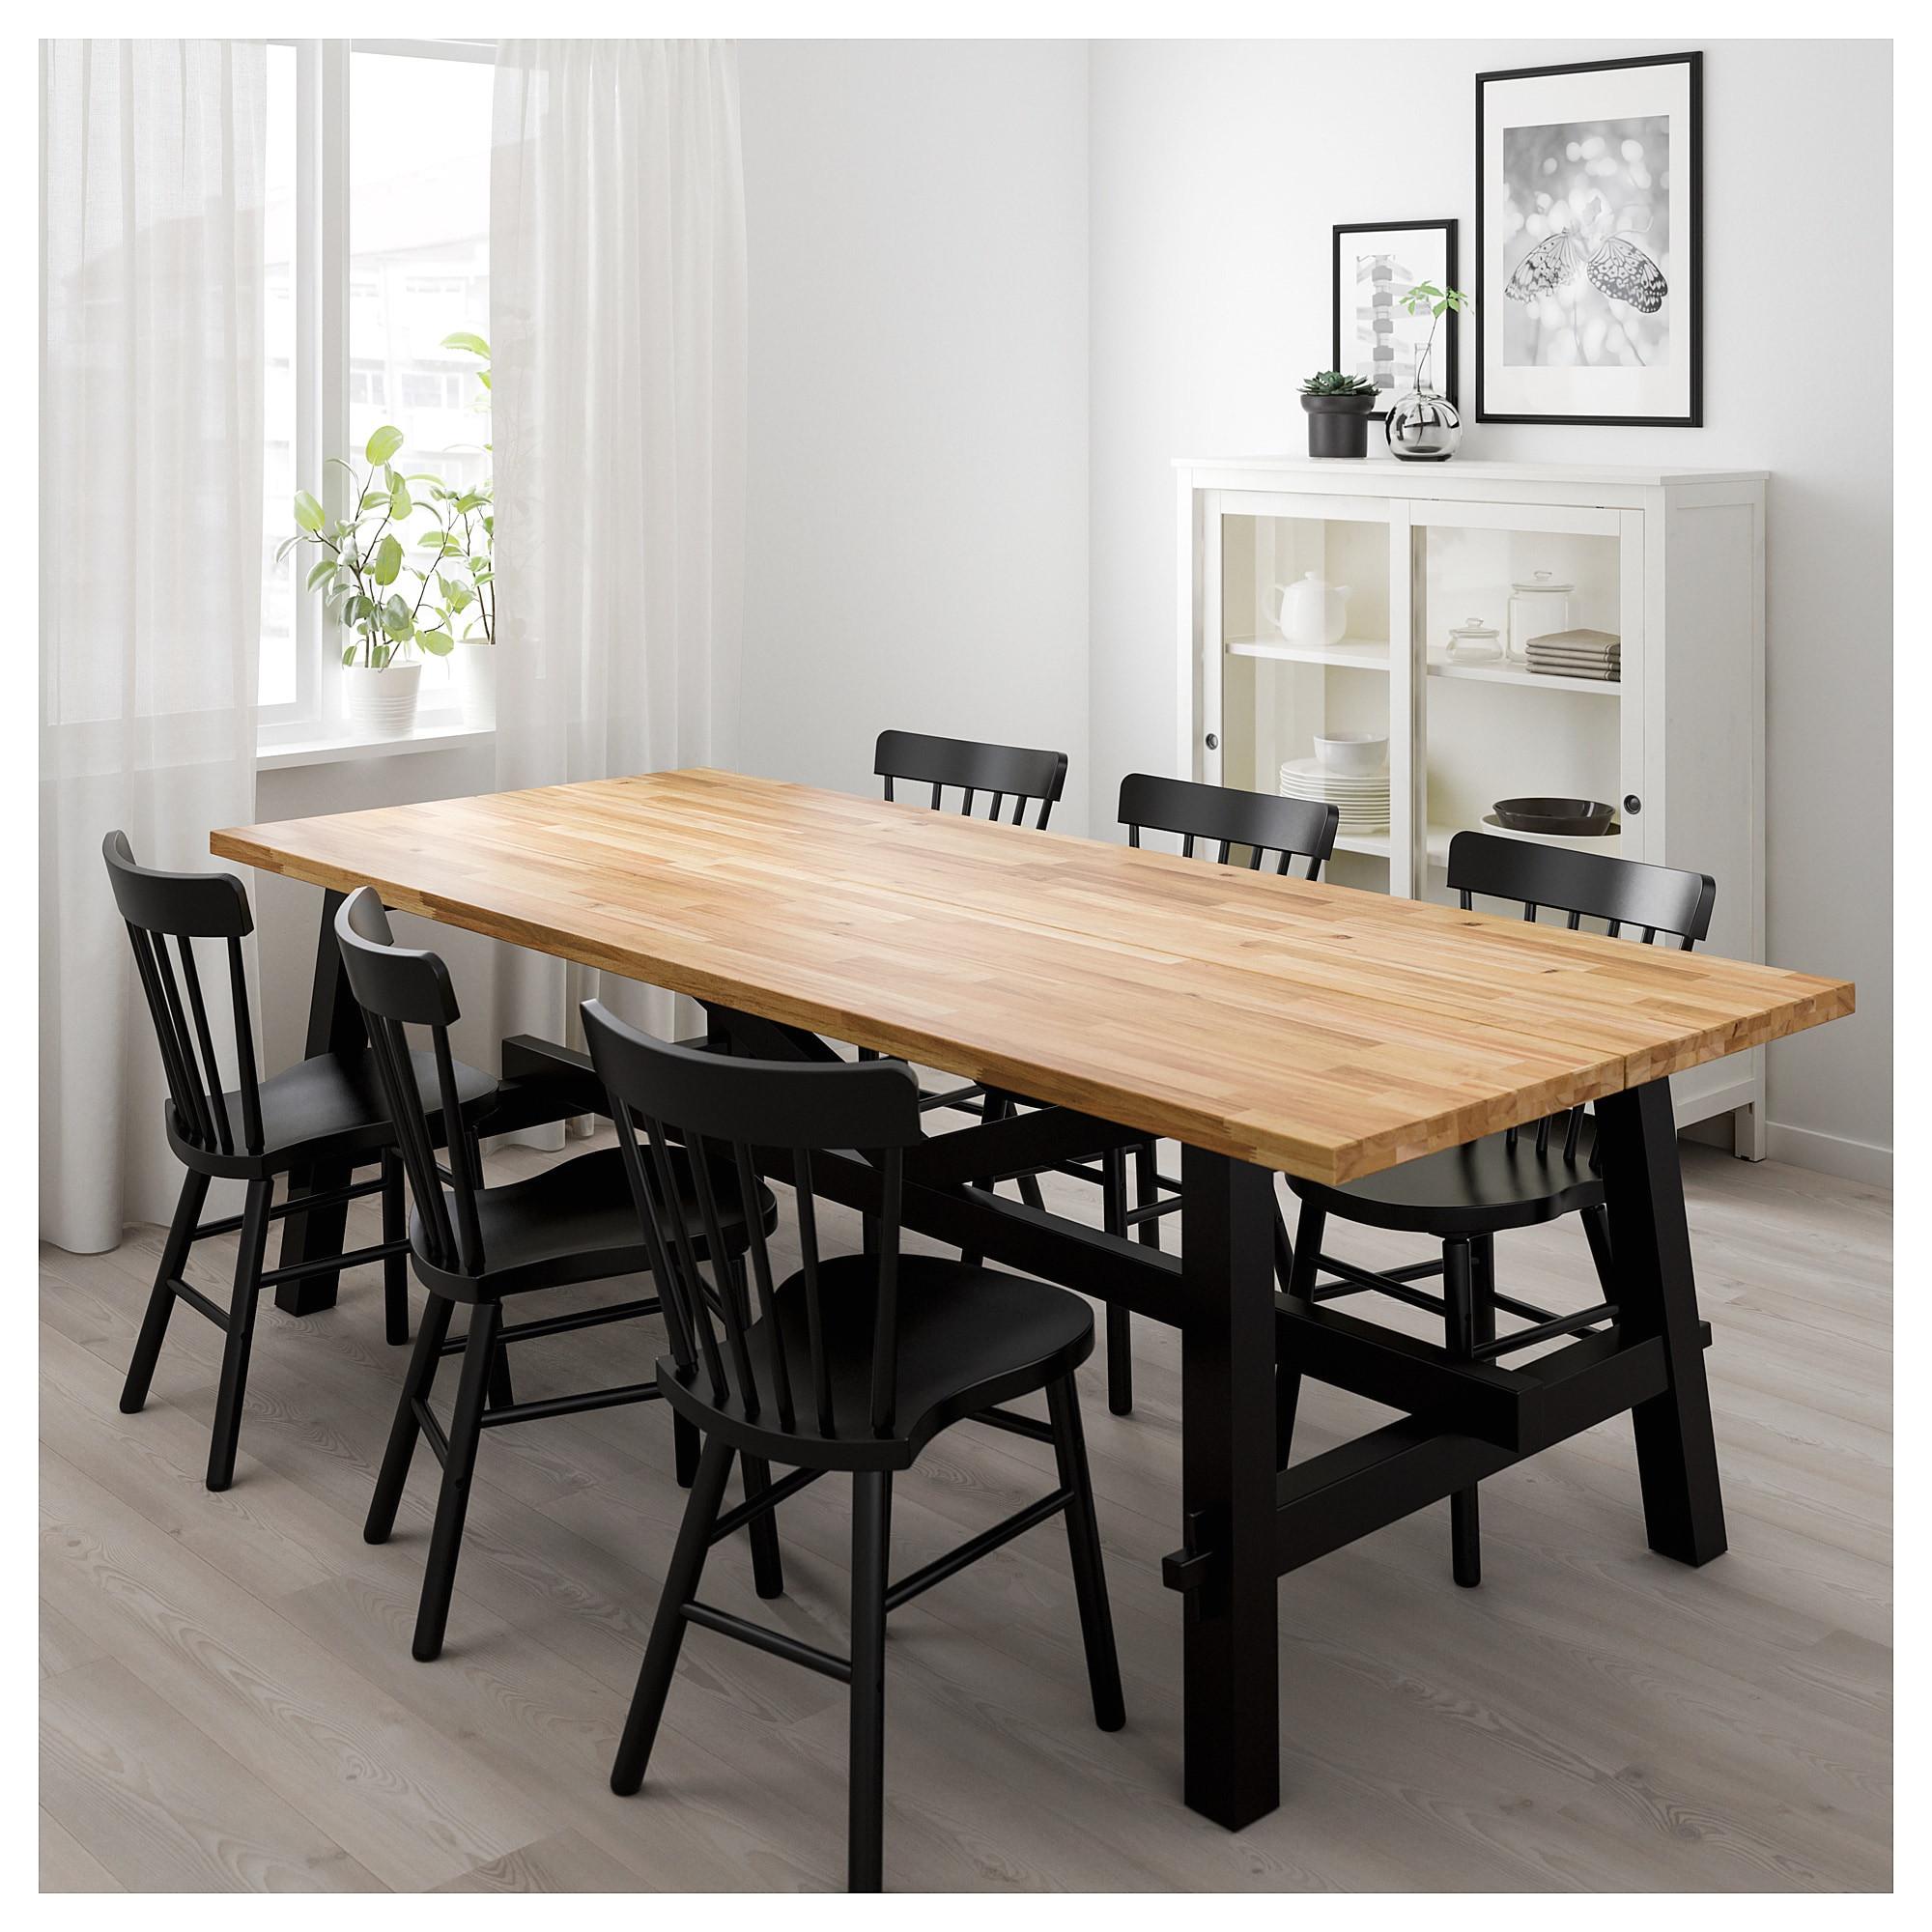 Clear Plastic Dining Chairs Ikea Skogsta Dining Table Acacia 235 X 100 Cm Ikea